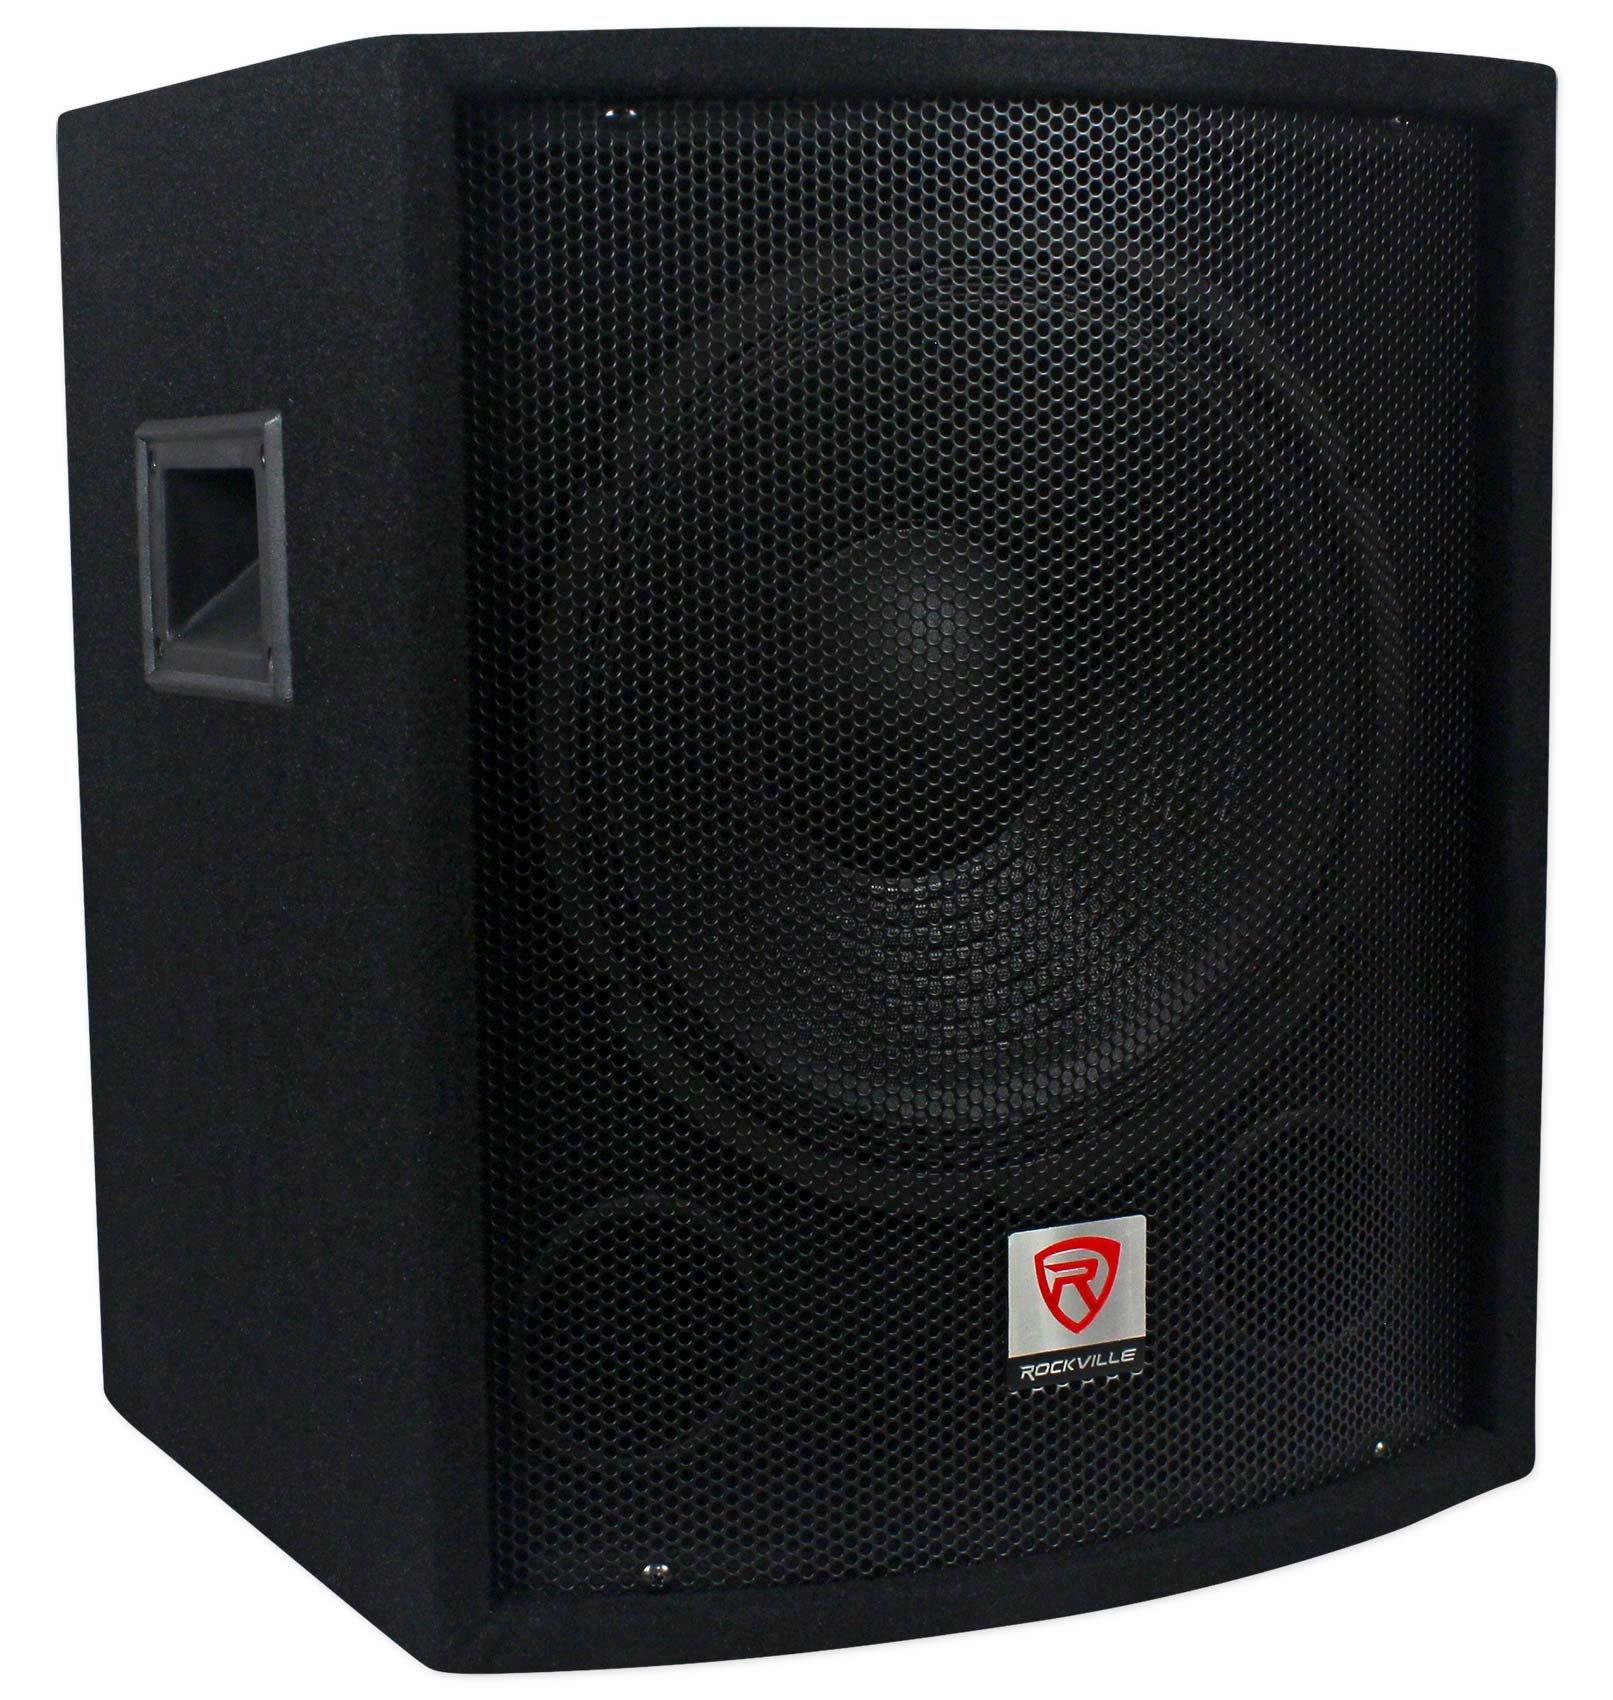 Rockville SBG1128 12'' 600 Watt Passive Pro DJ Subwoofer, MDF Cabinet/Pole Mount by Rockville (Image #3)